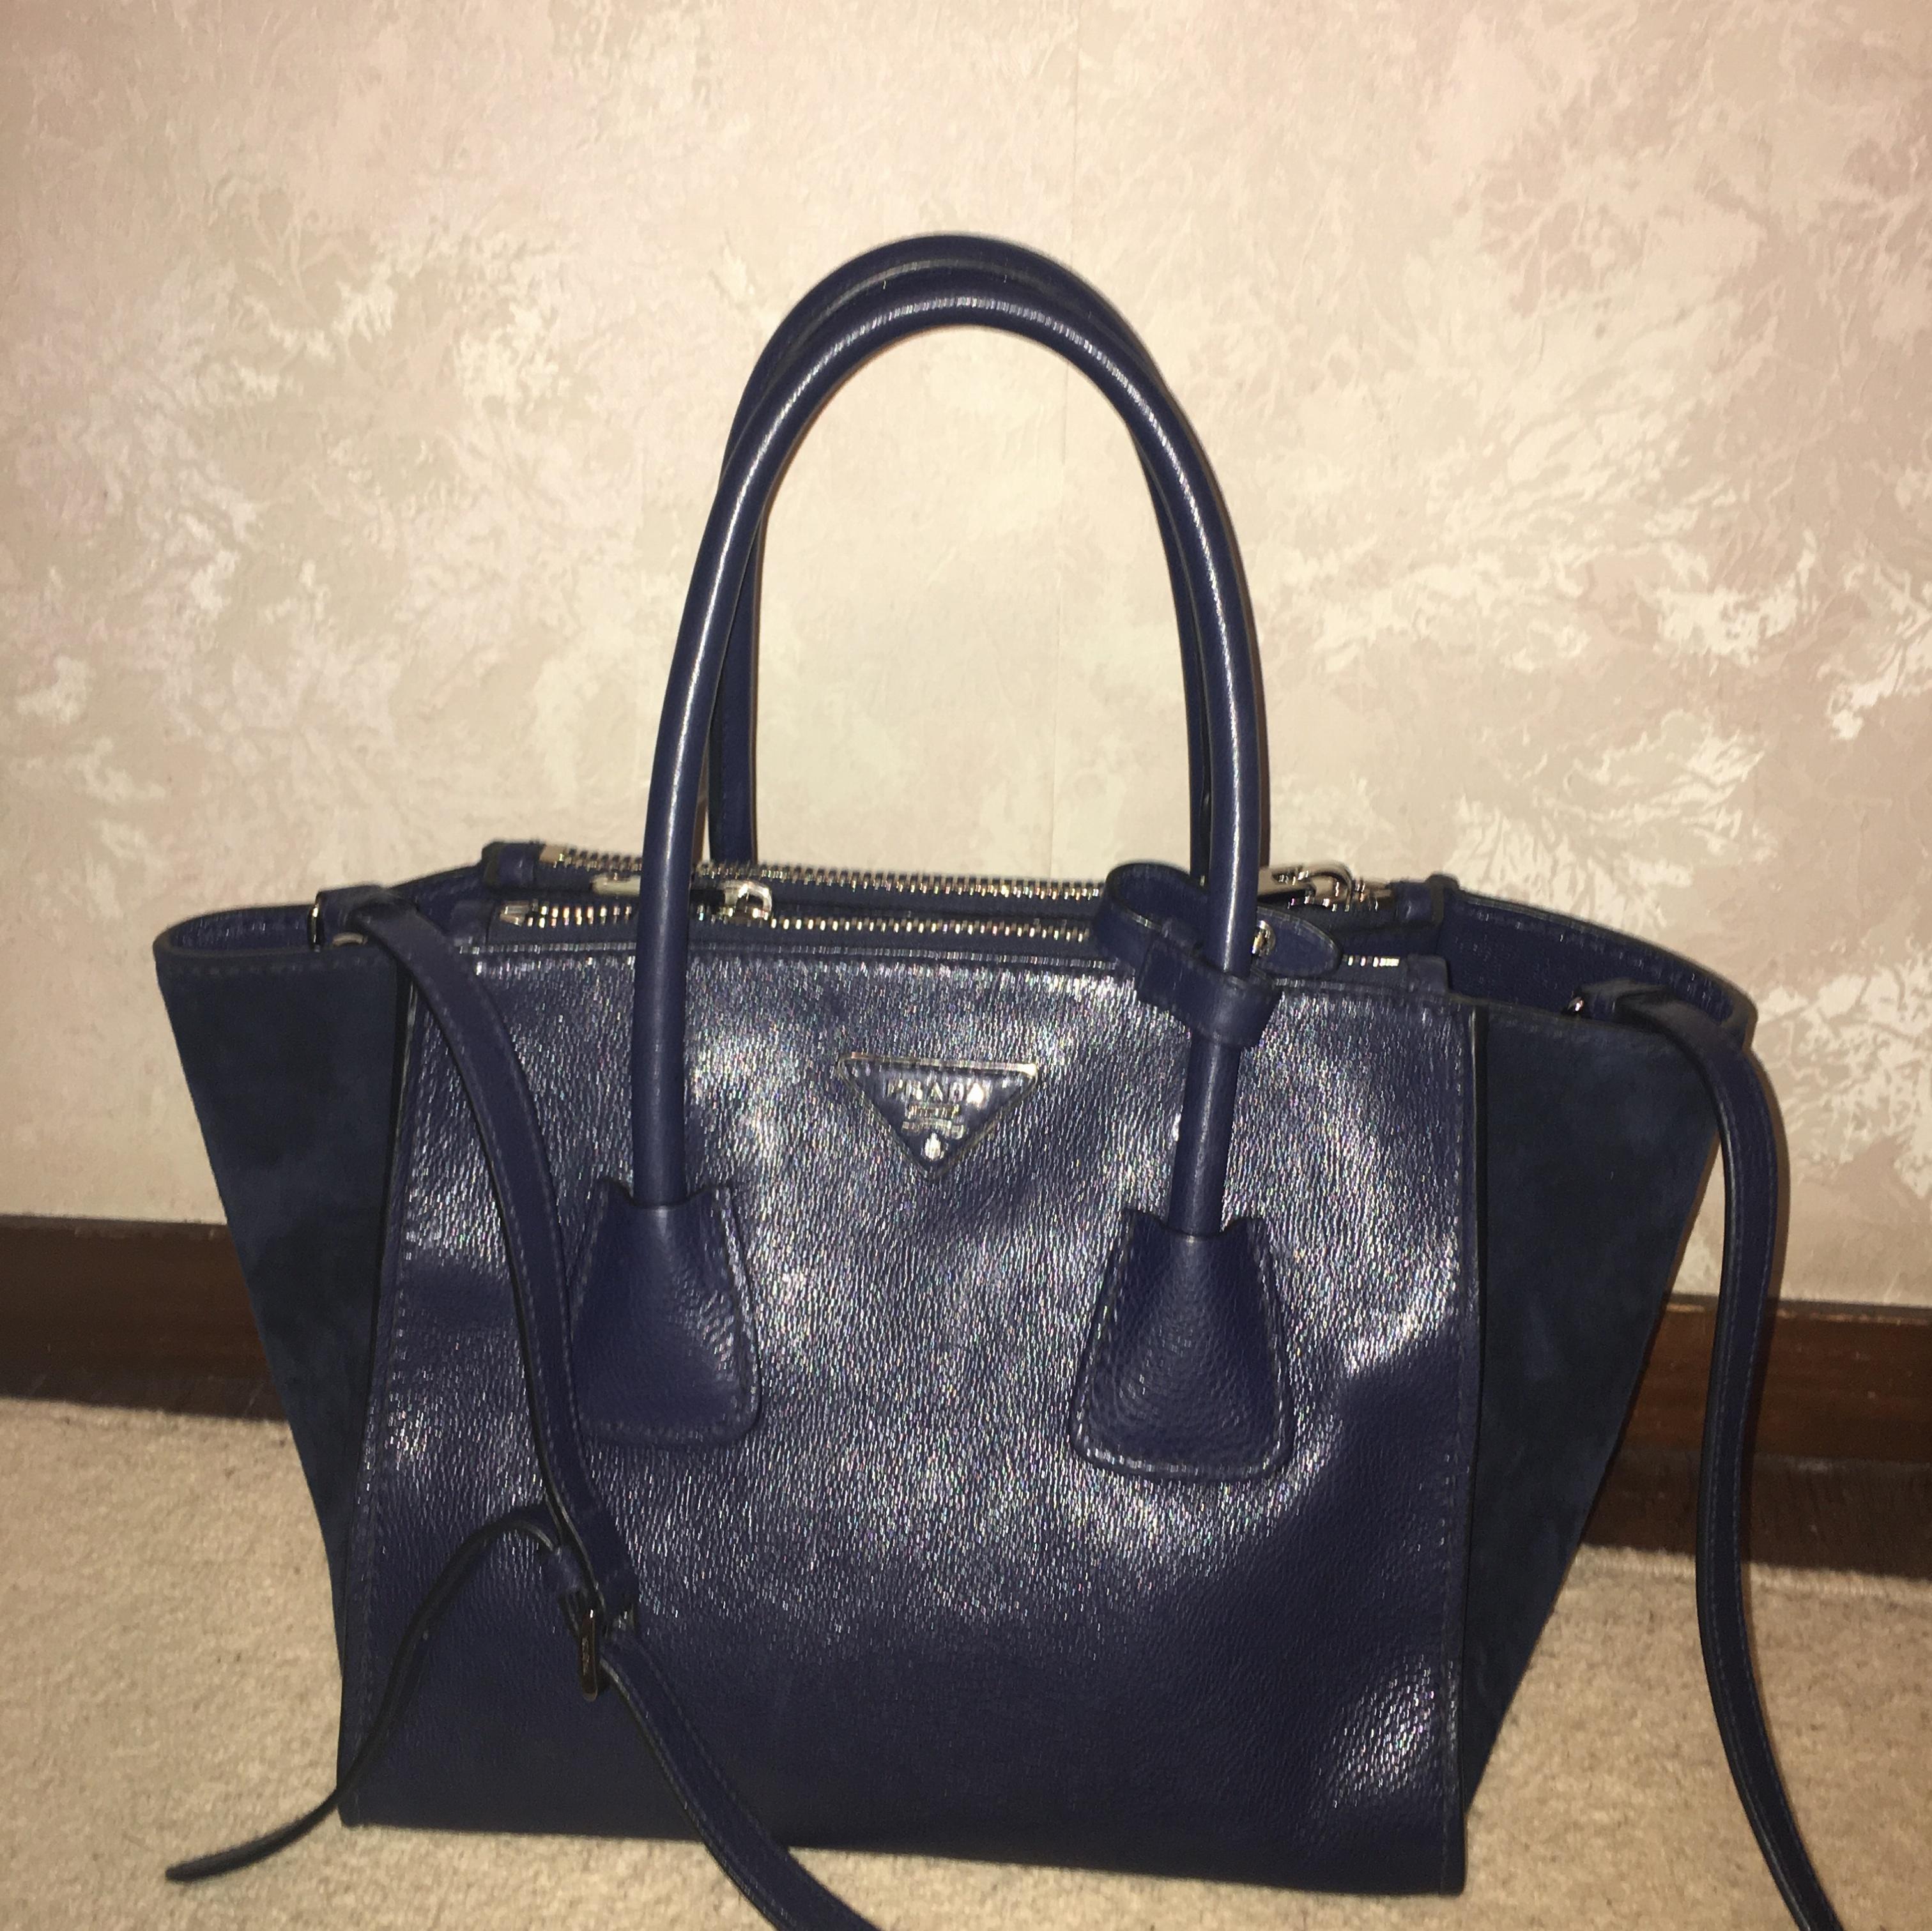 PRADAのバッグ!使いやすくて可愛い優秀なバッグです^_^_1